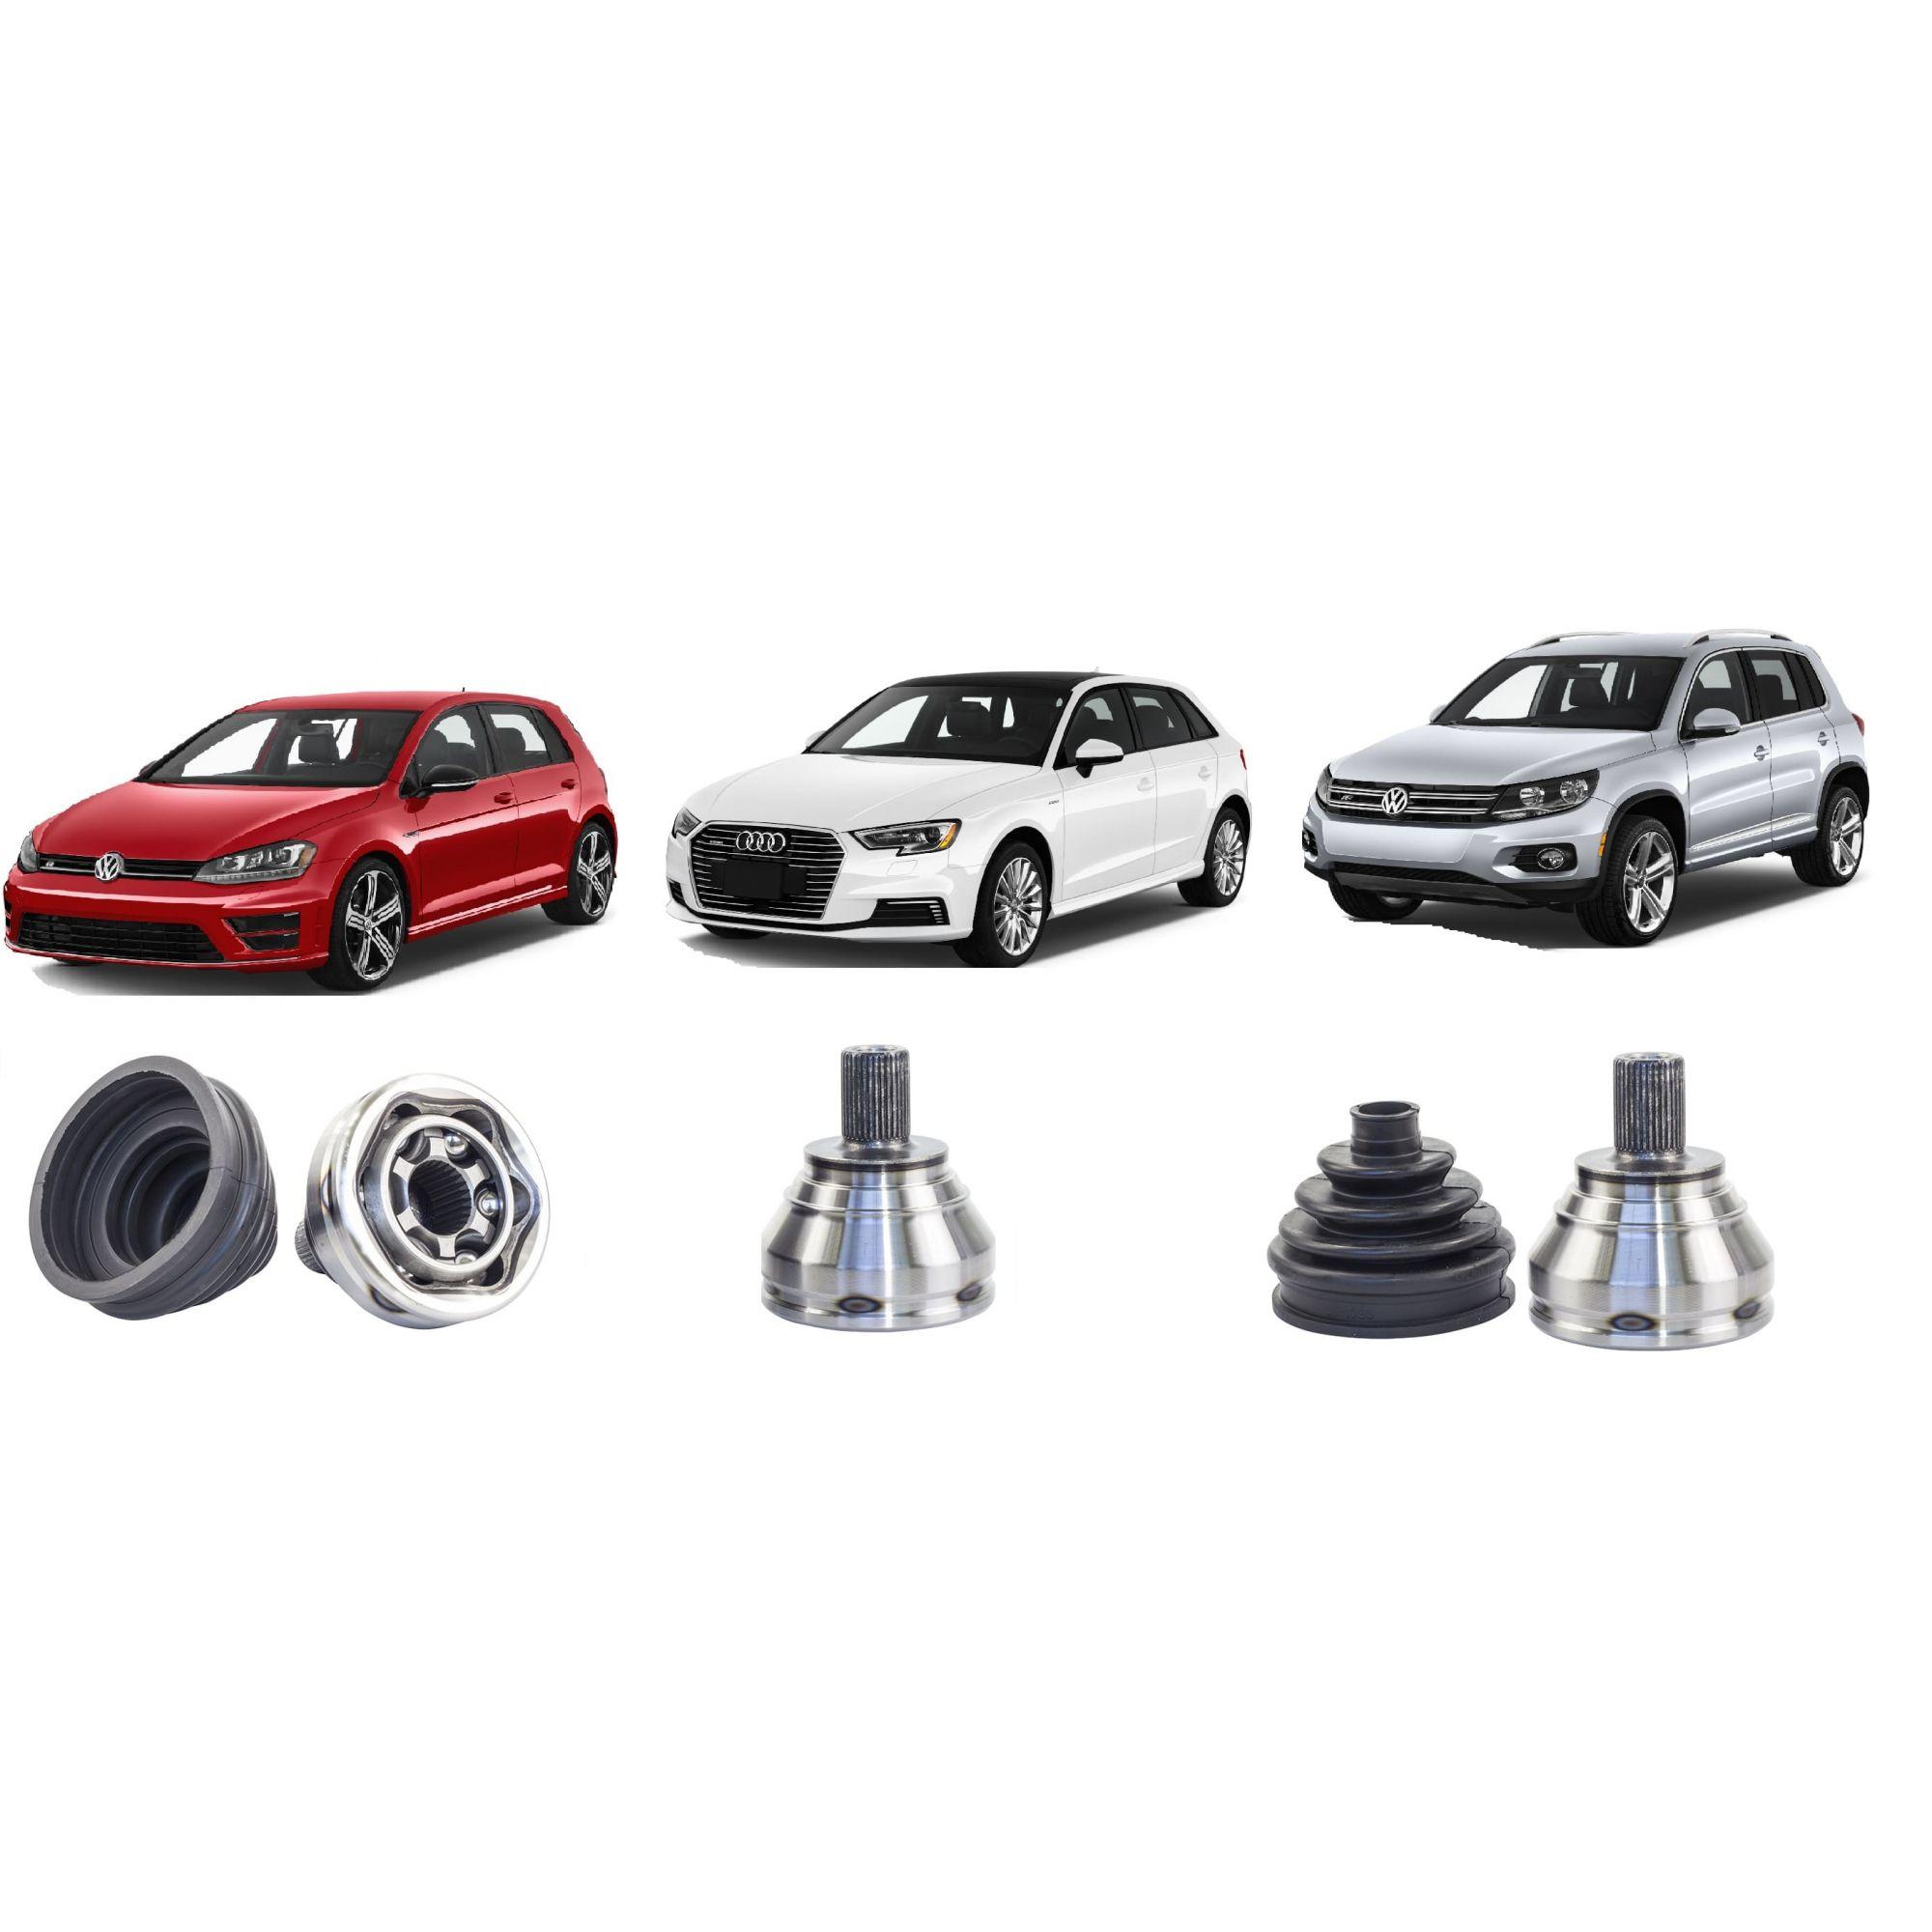 Junta Homocinética Audi A3 Sportback 1.6/2.0 08...A3 Ambition 14... VW Bora Golf Jetta Passat Tiguan  27x36 IL